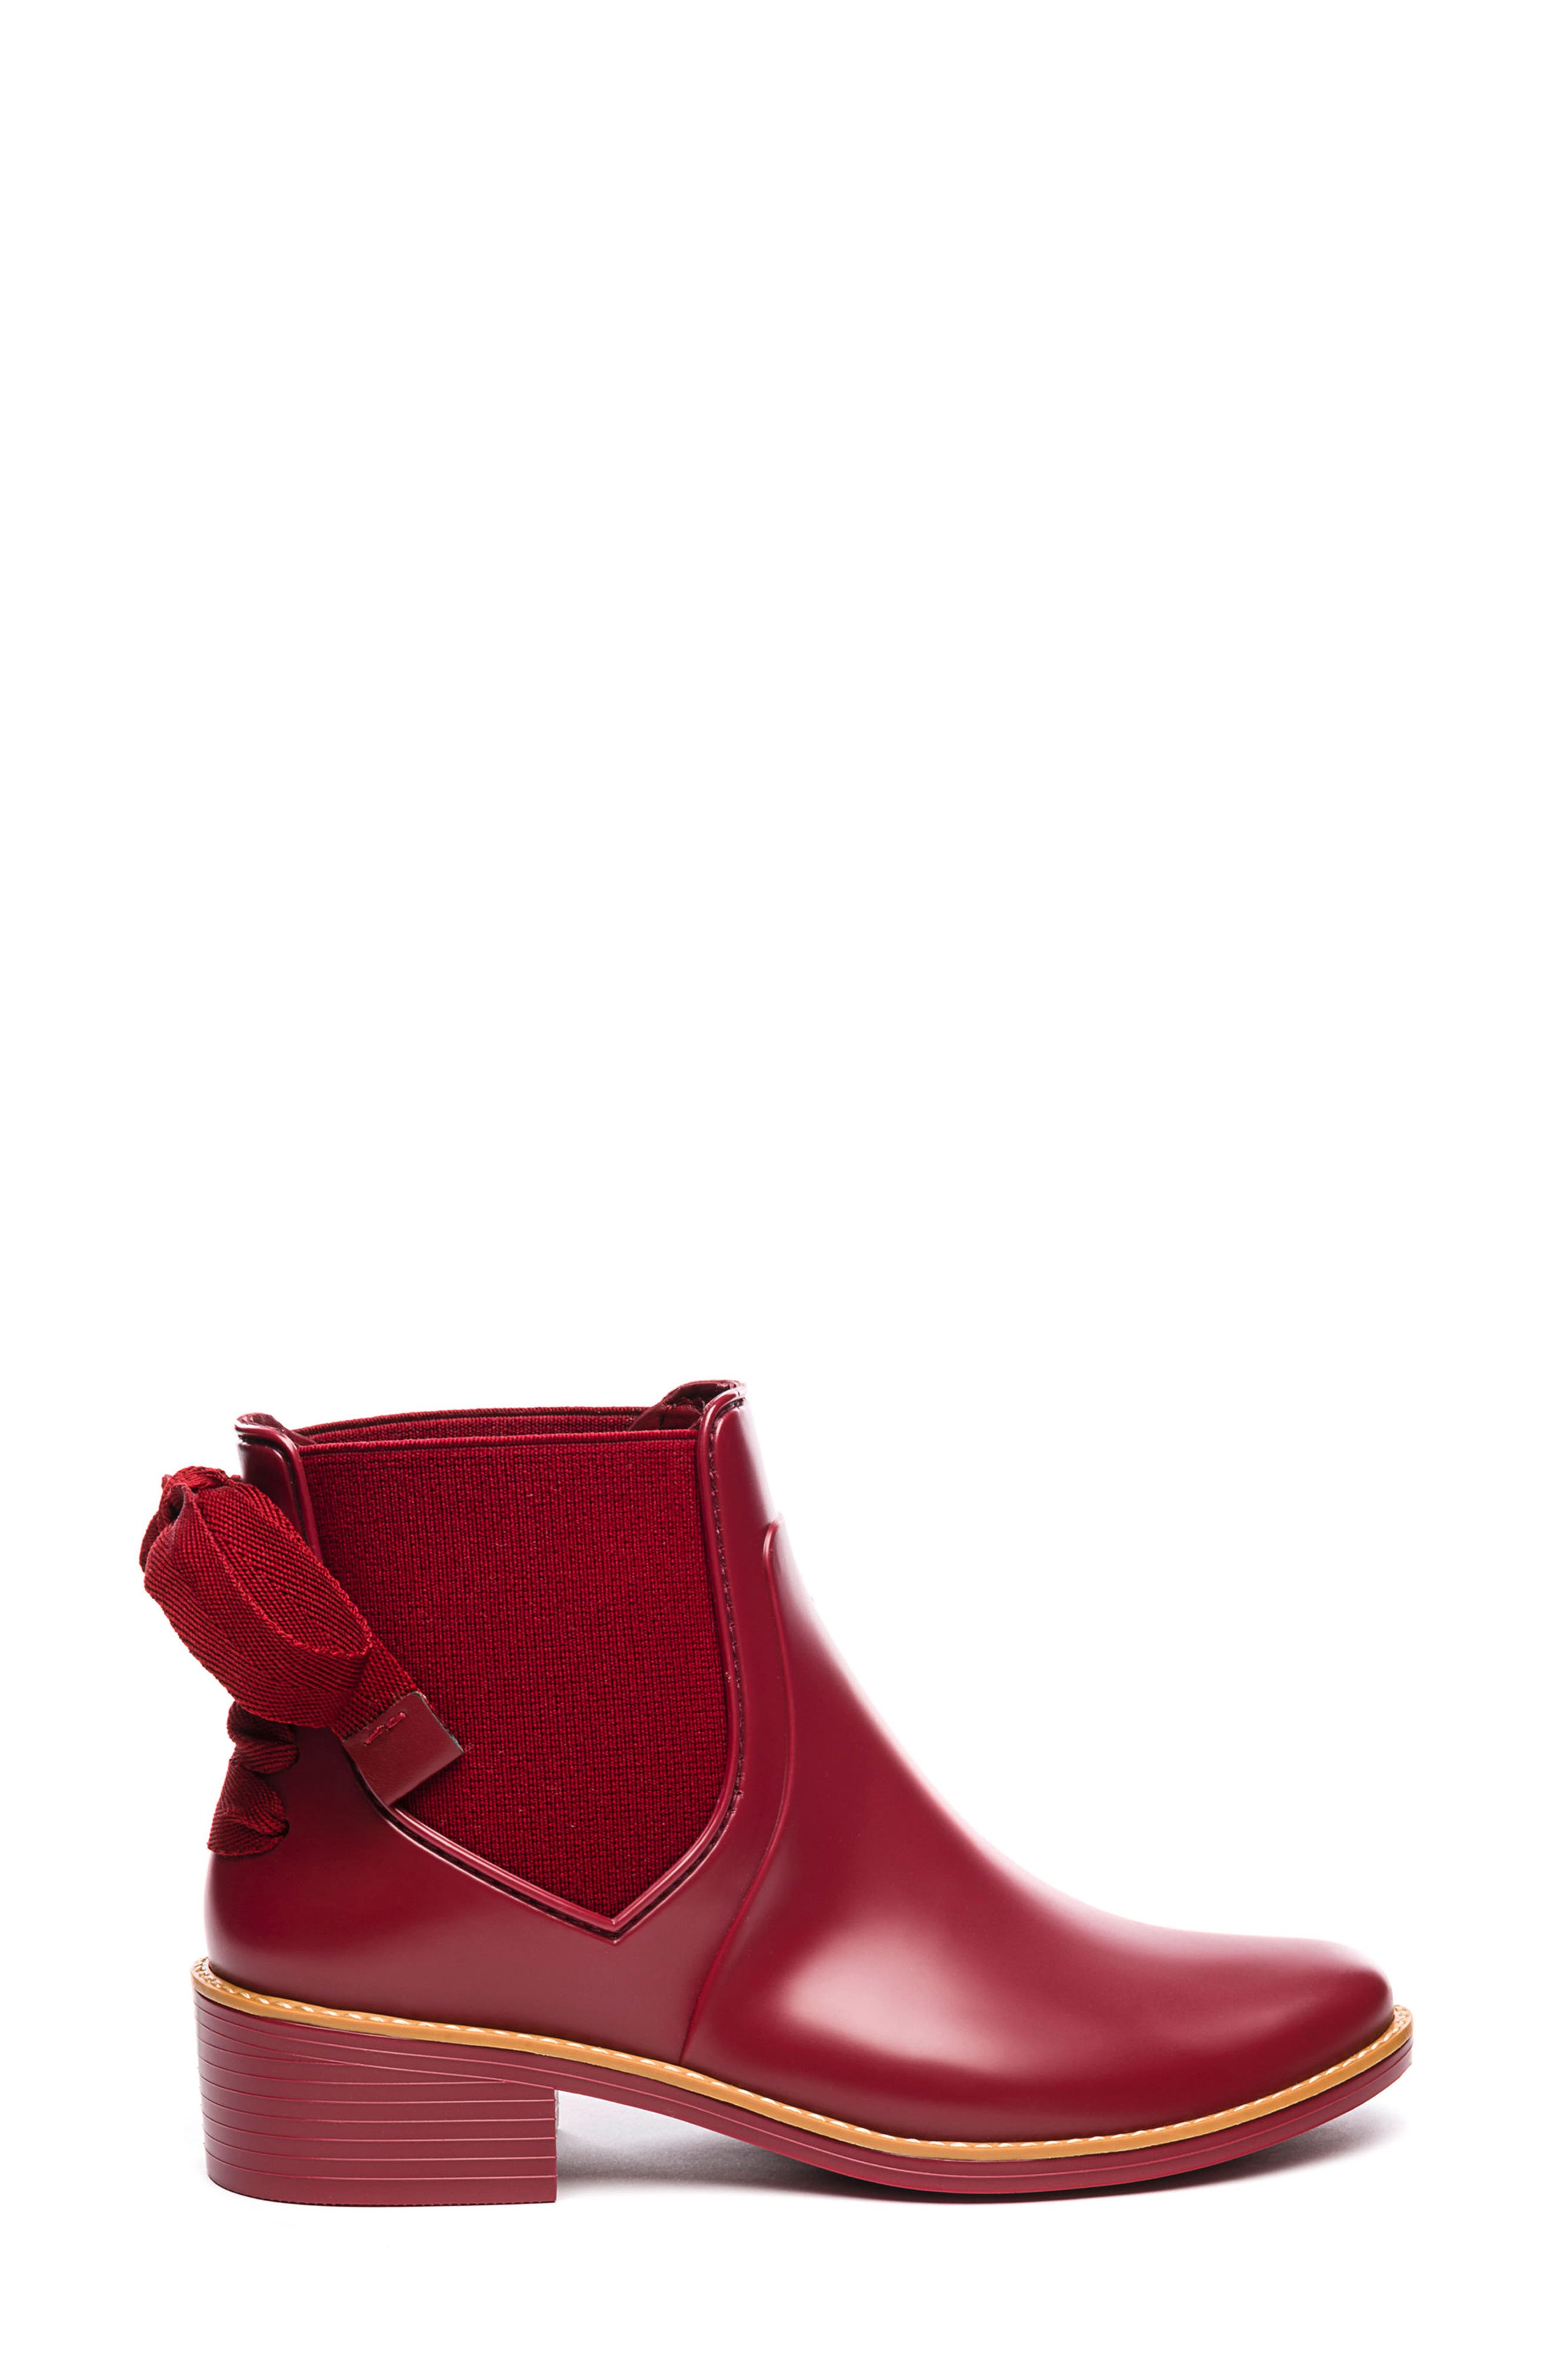 Paxton Rain Boot,                             Alternate thumbnail 3, color,                             930